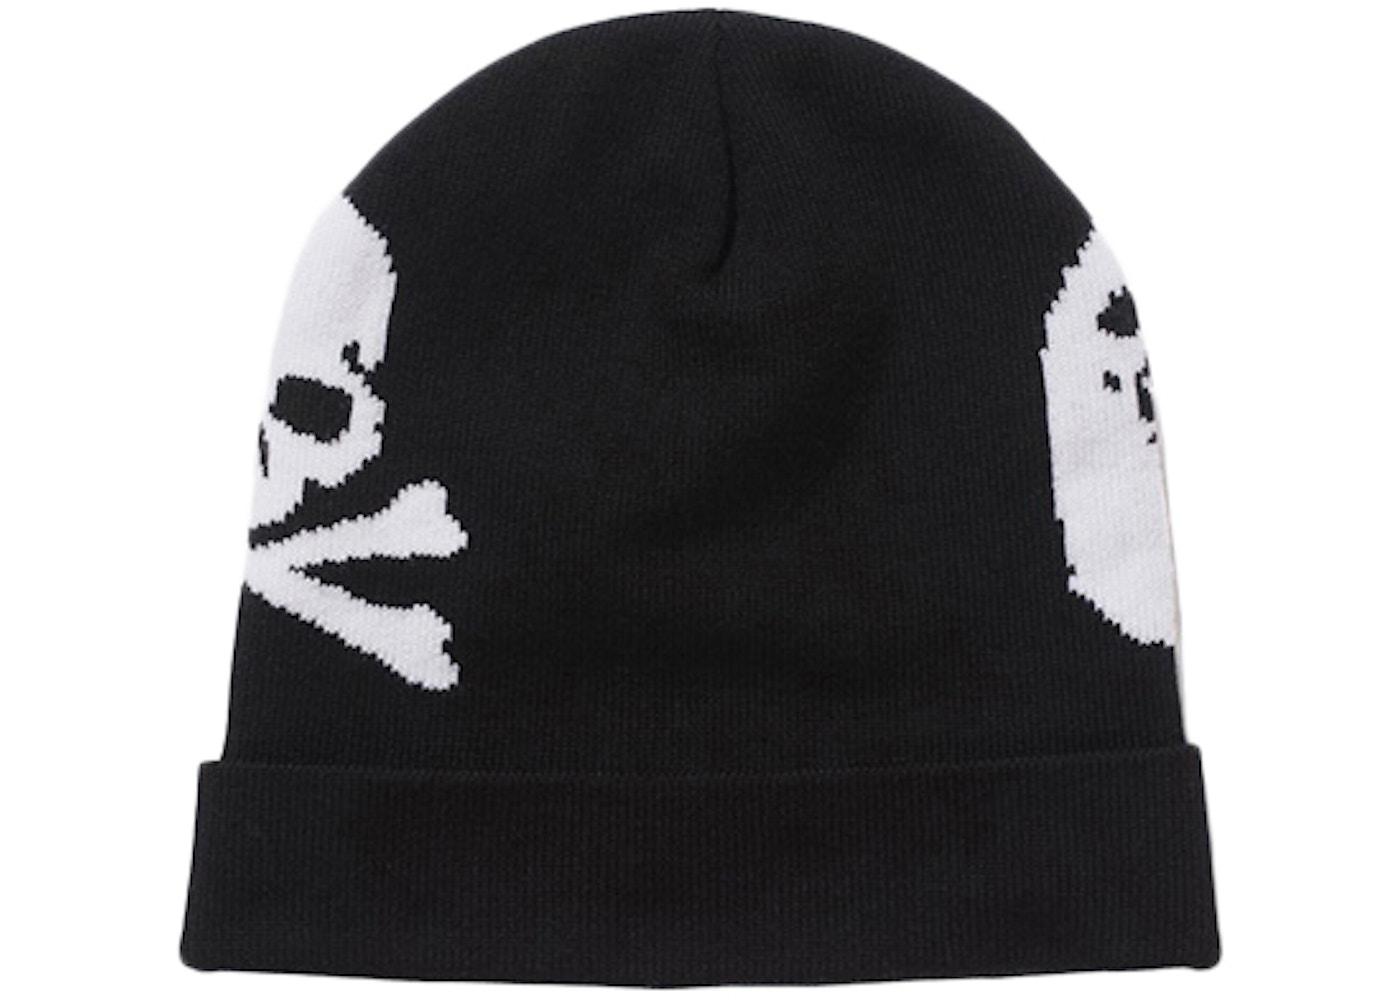 b352900b264 Sell. or Ask. View All Bids. BAPE X Mastermind Japan Apehead Skull Beanie  Black